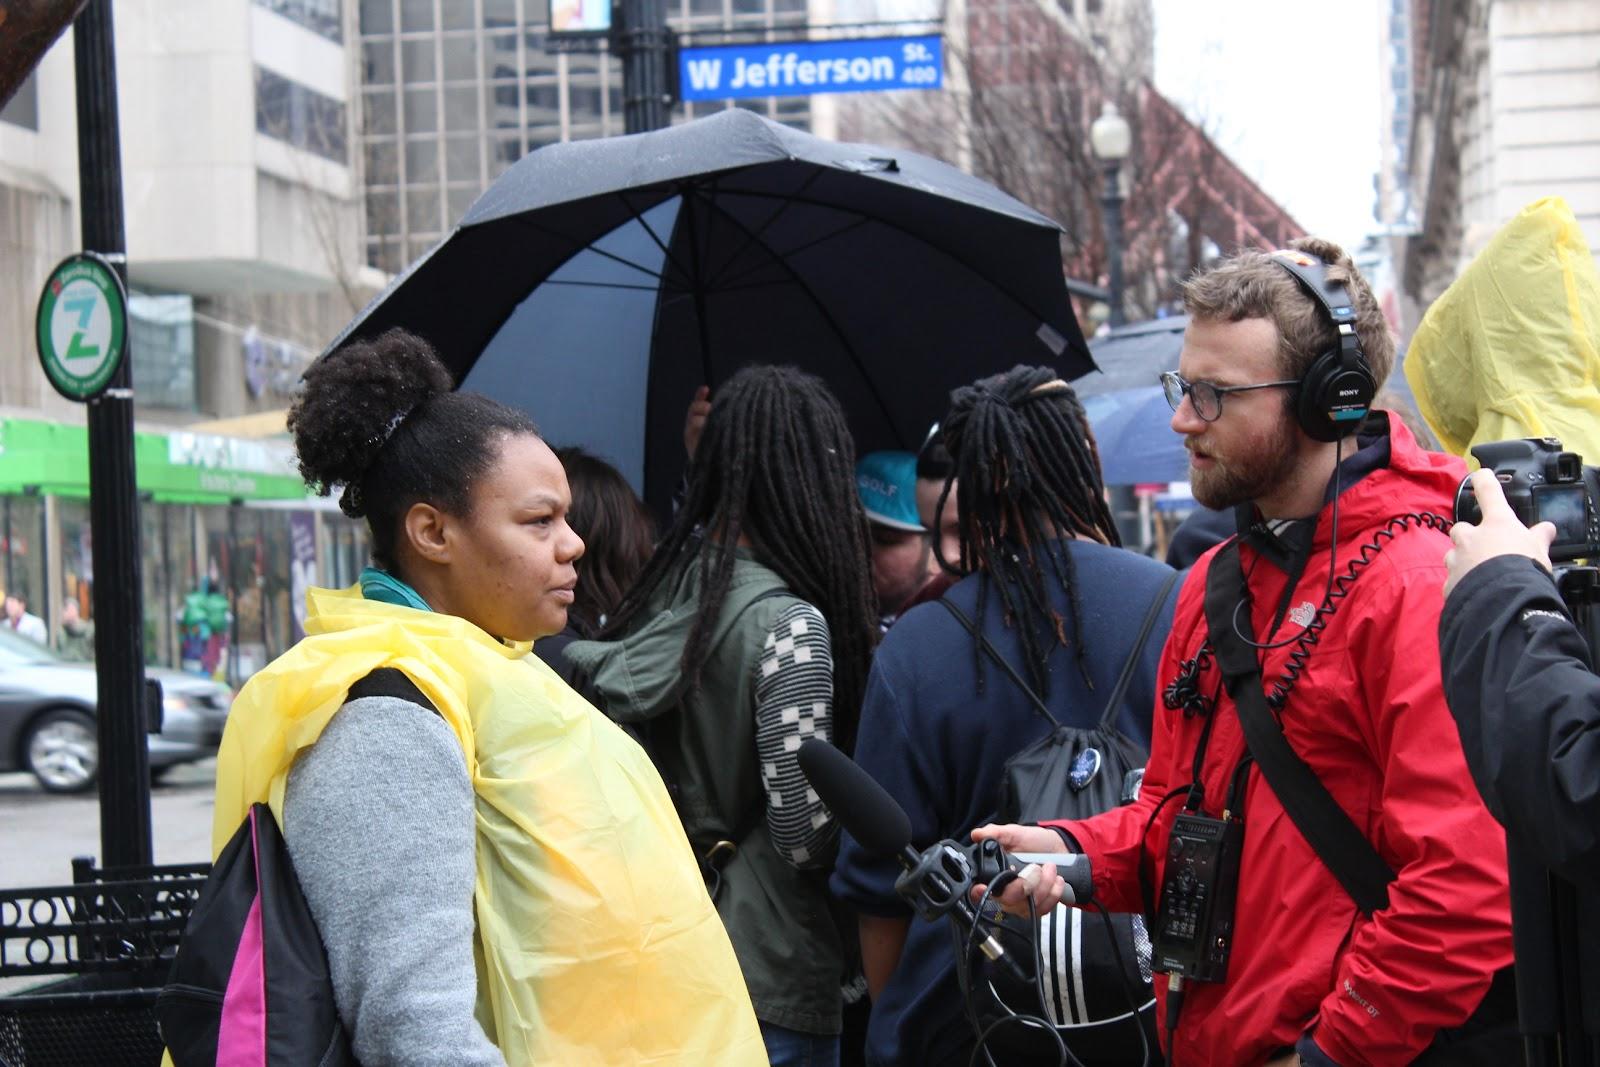 Black woman getting interviewed in Louisville